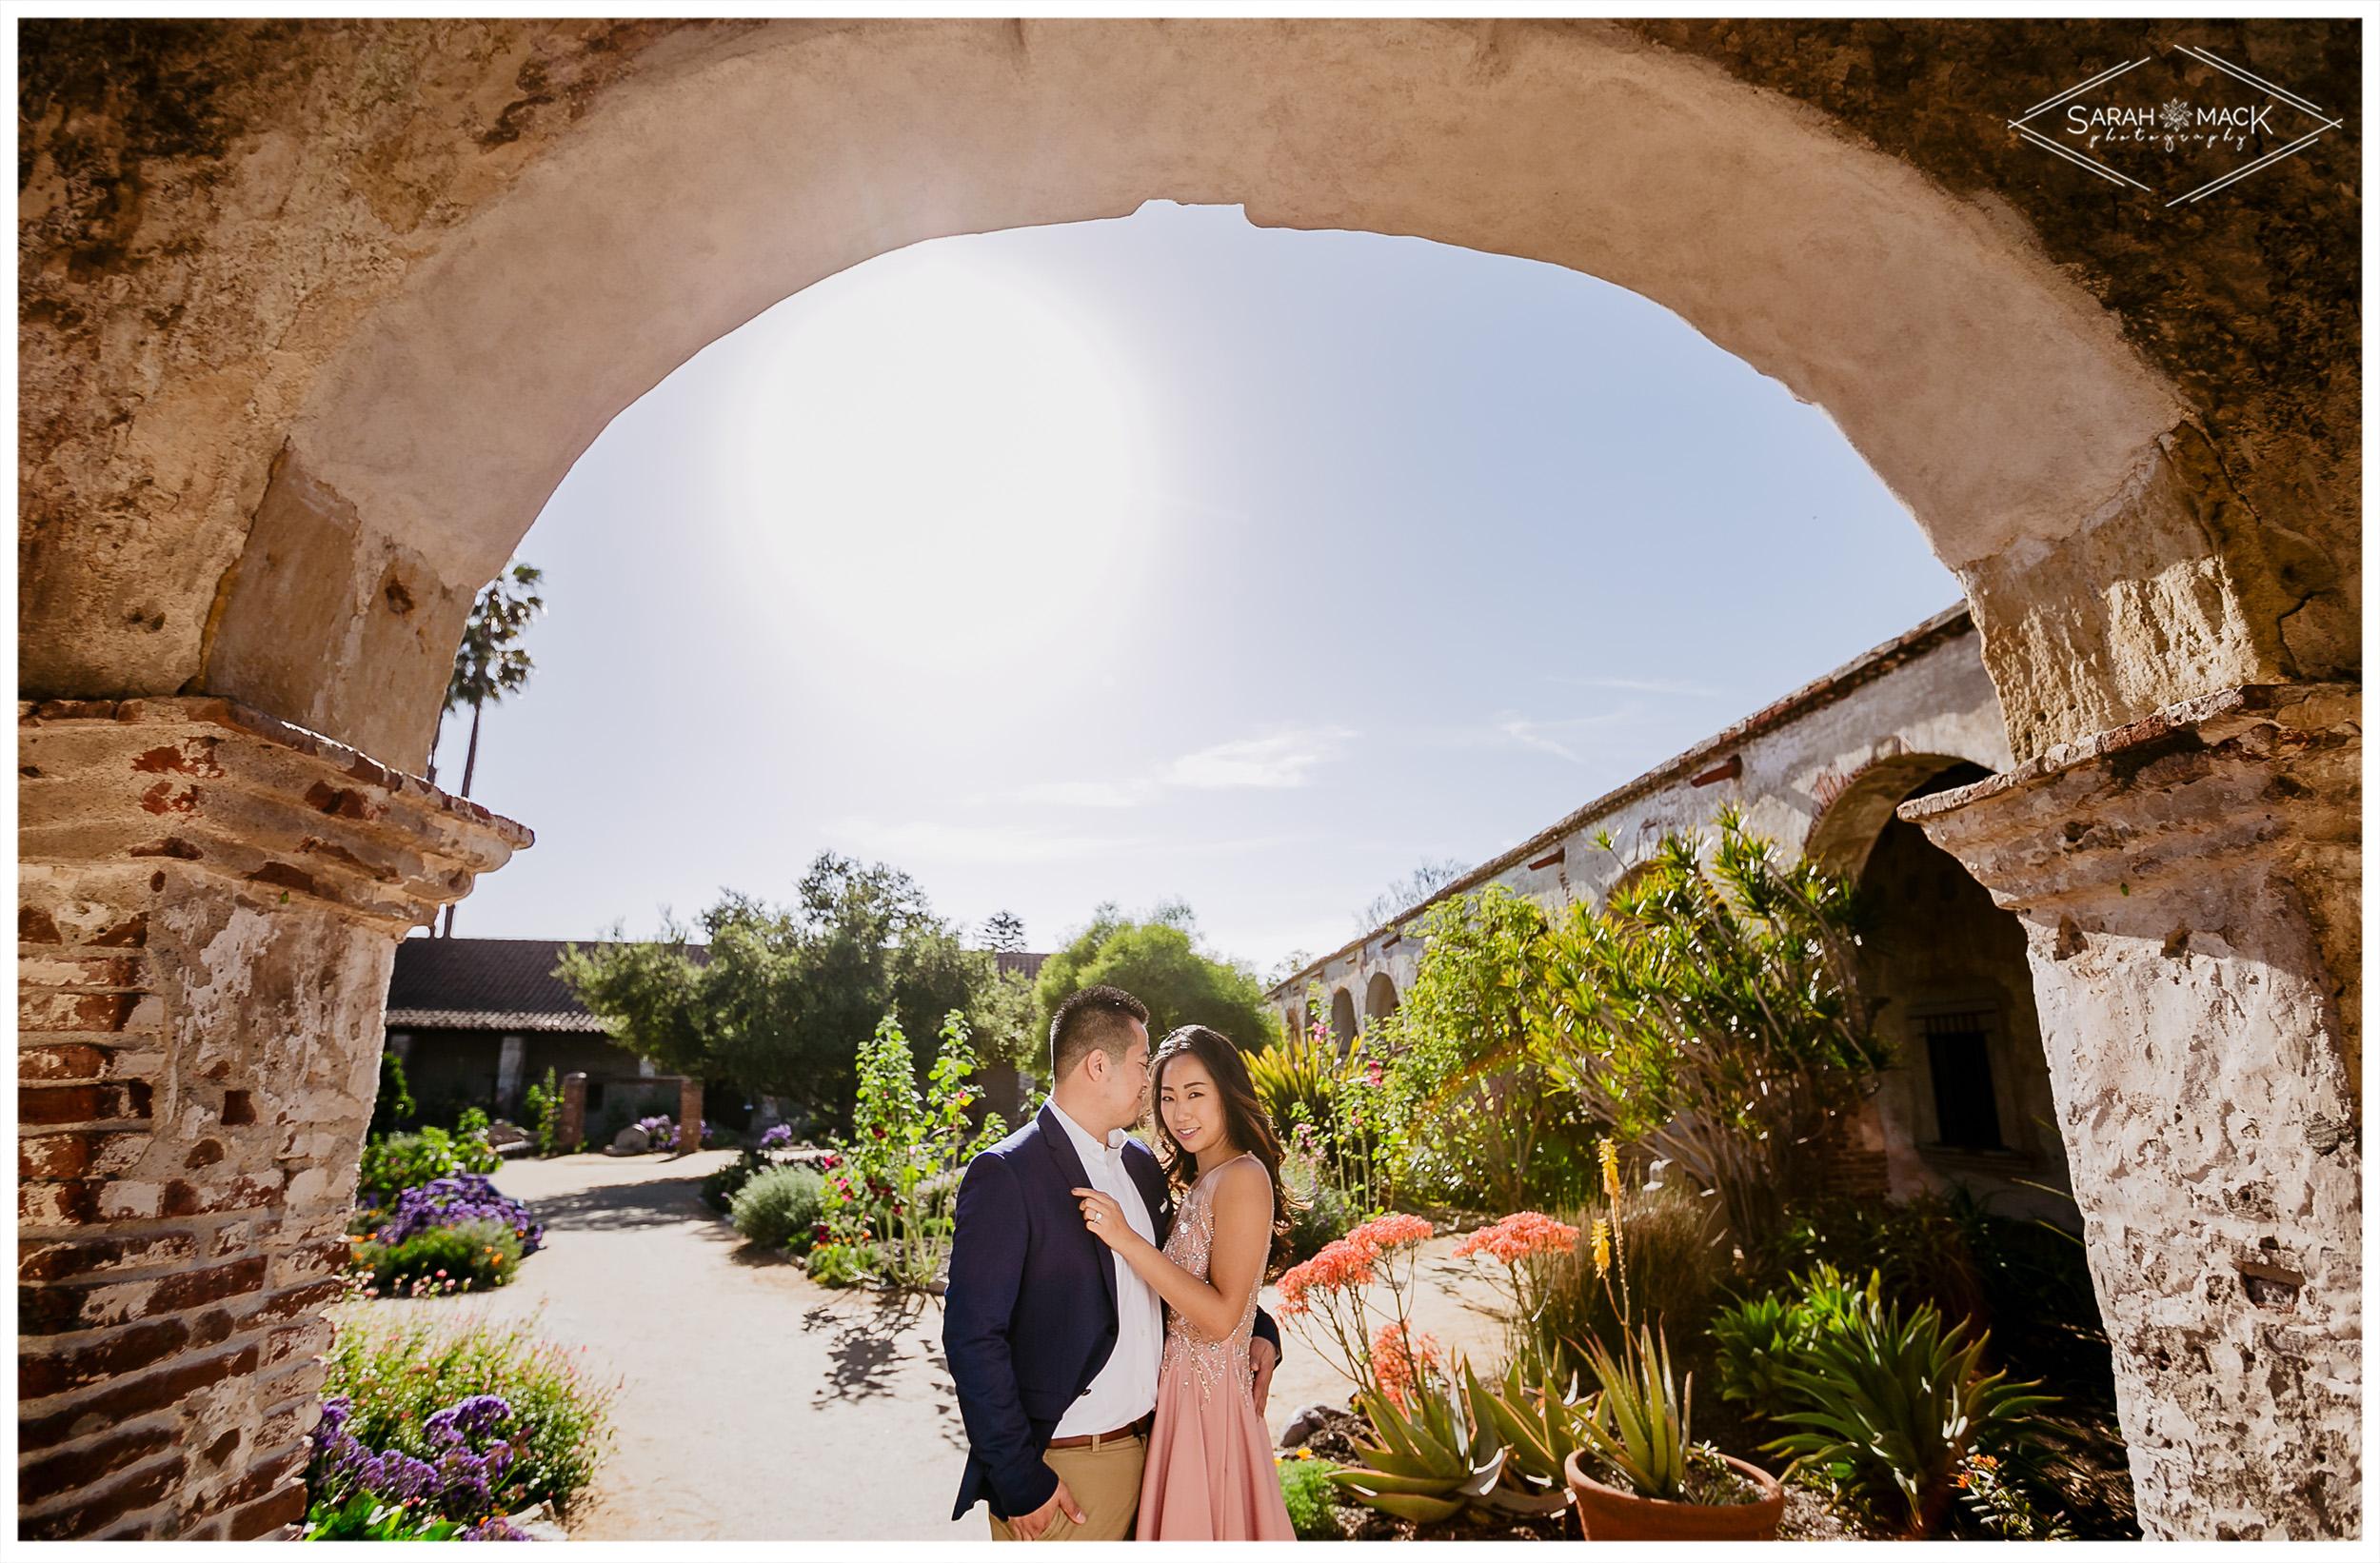 CJ-Mission-San-Juan-Capistrano-Engagement-Photography-13.jpg